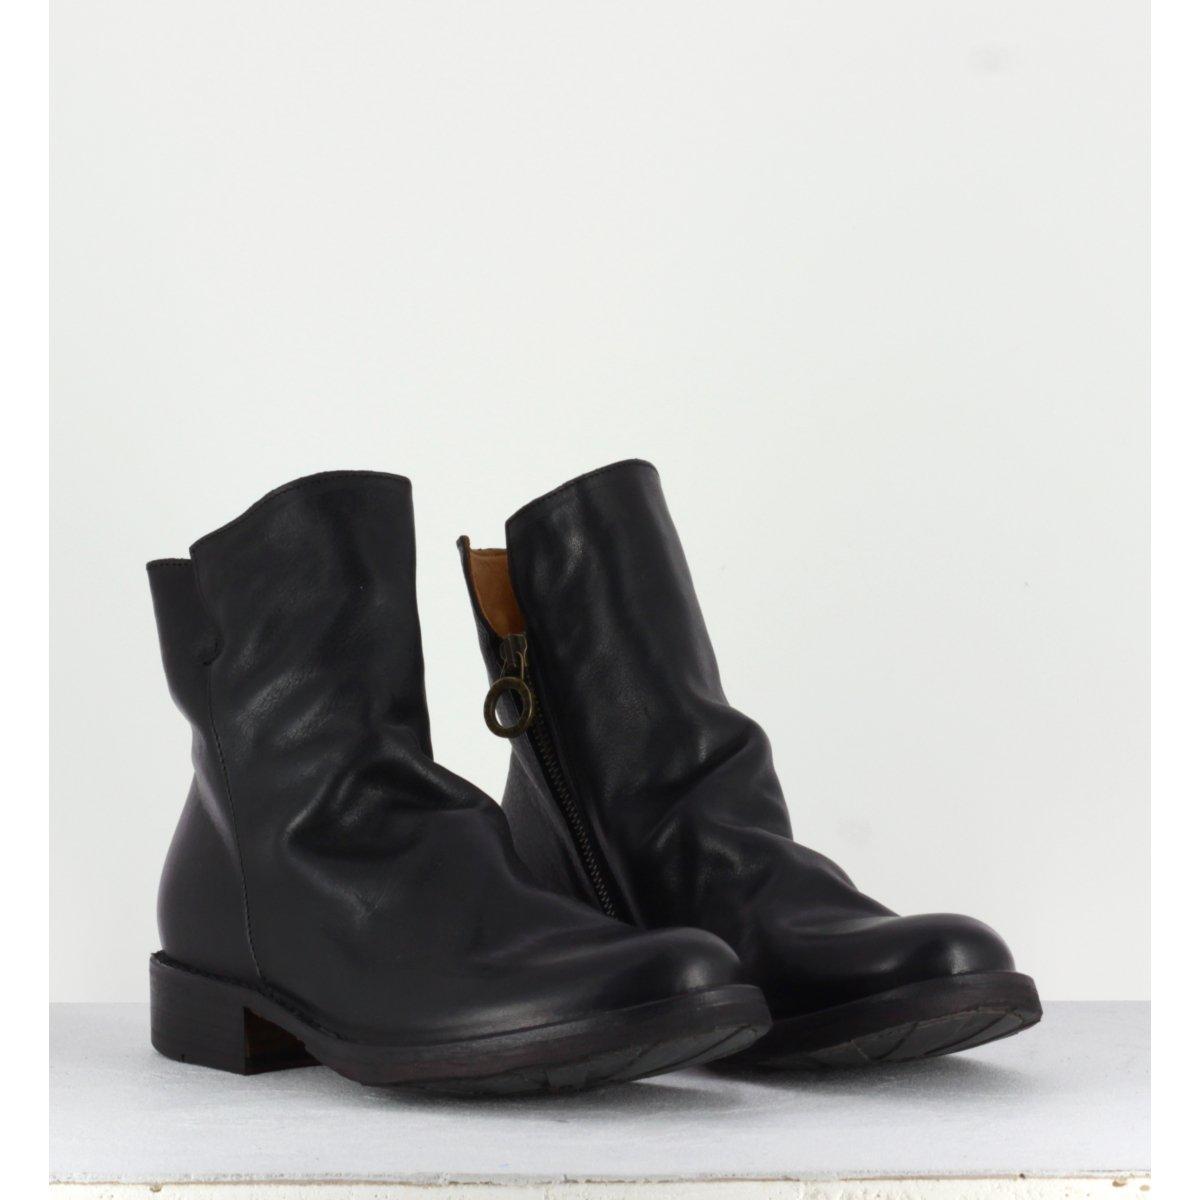 Bottines plates en cuir noir Fiorentini Baker - Eternity ELF